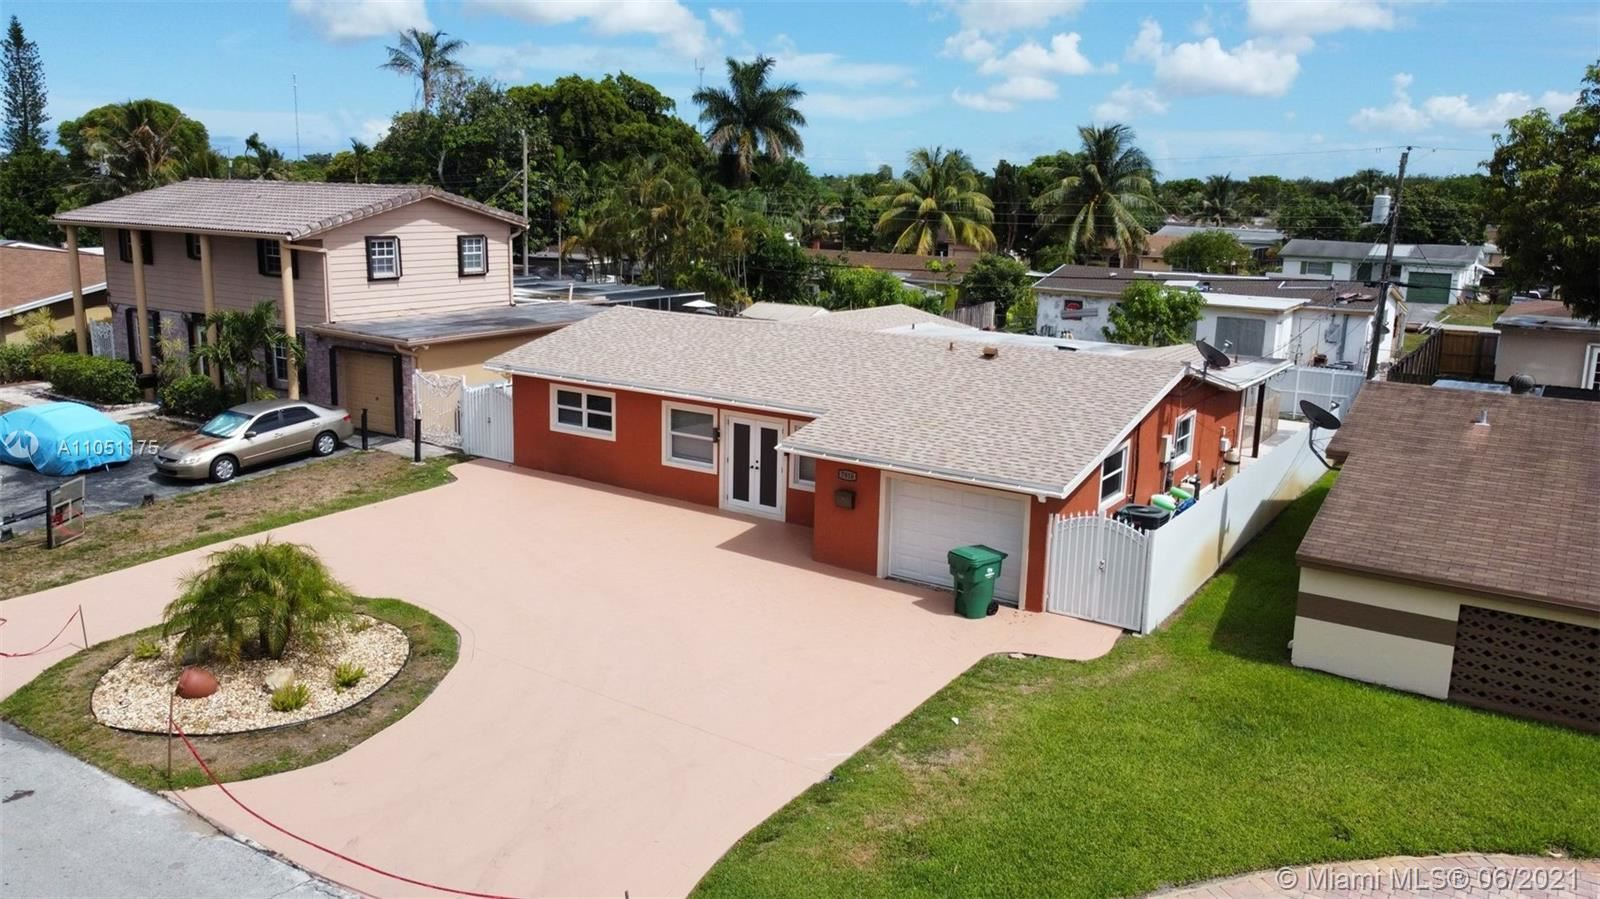 7816 Plantation Blvd, Miramar, FL 33023 - #: A11051175